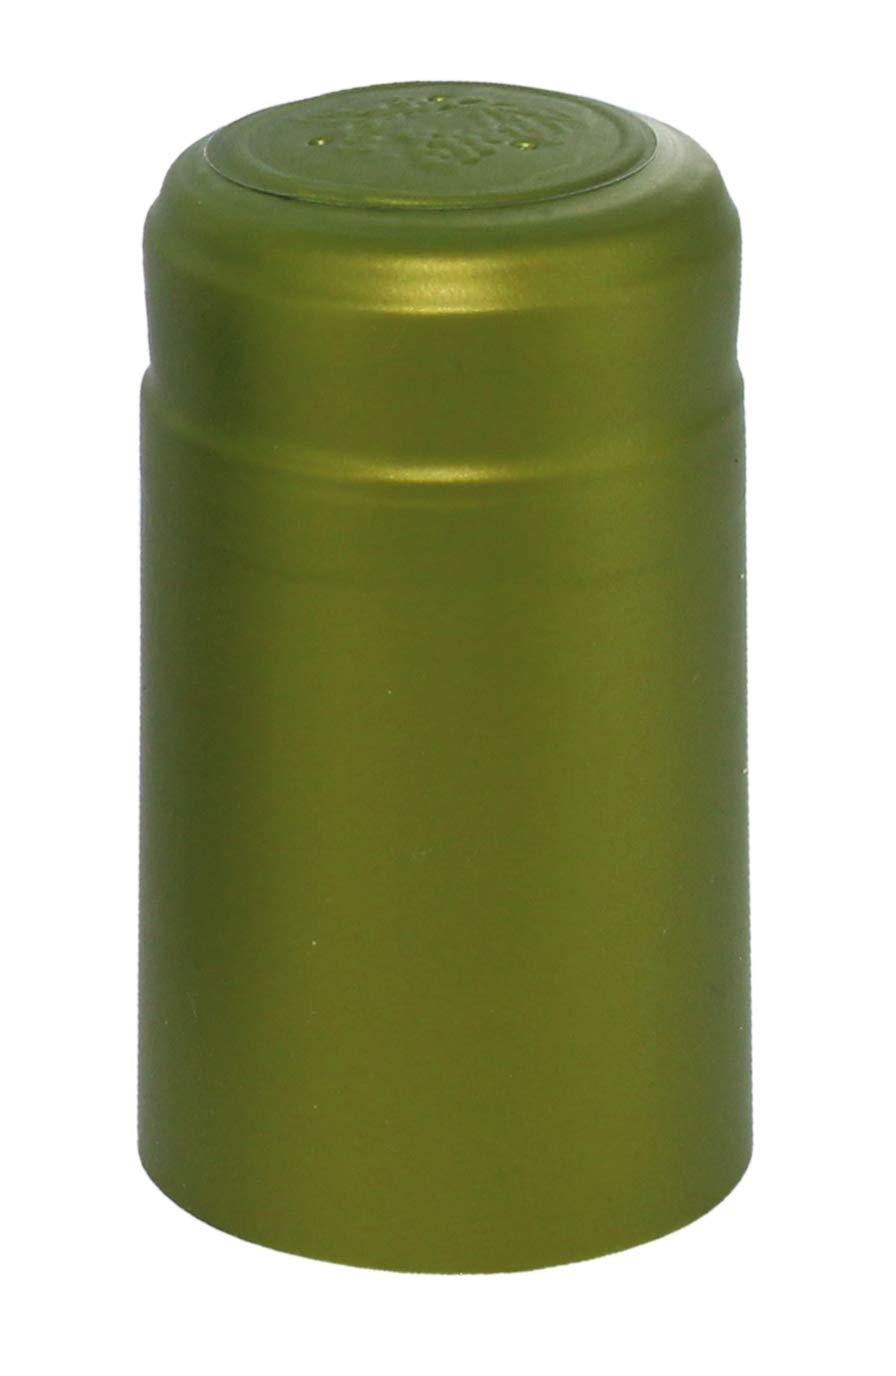 PVC Heat Shrink Capsules For Wine Bottles Metallic Lime Green 100 count